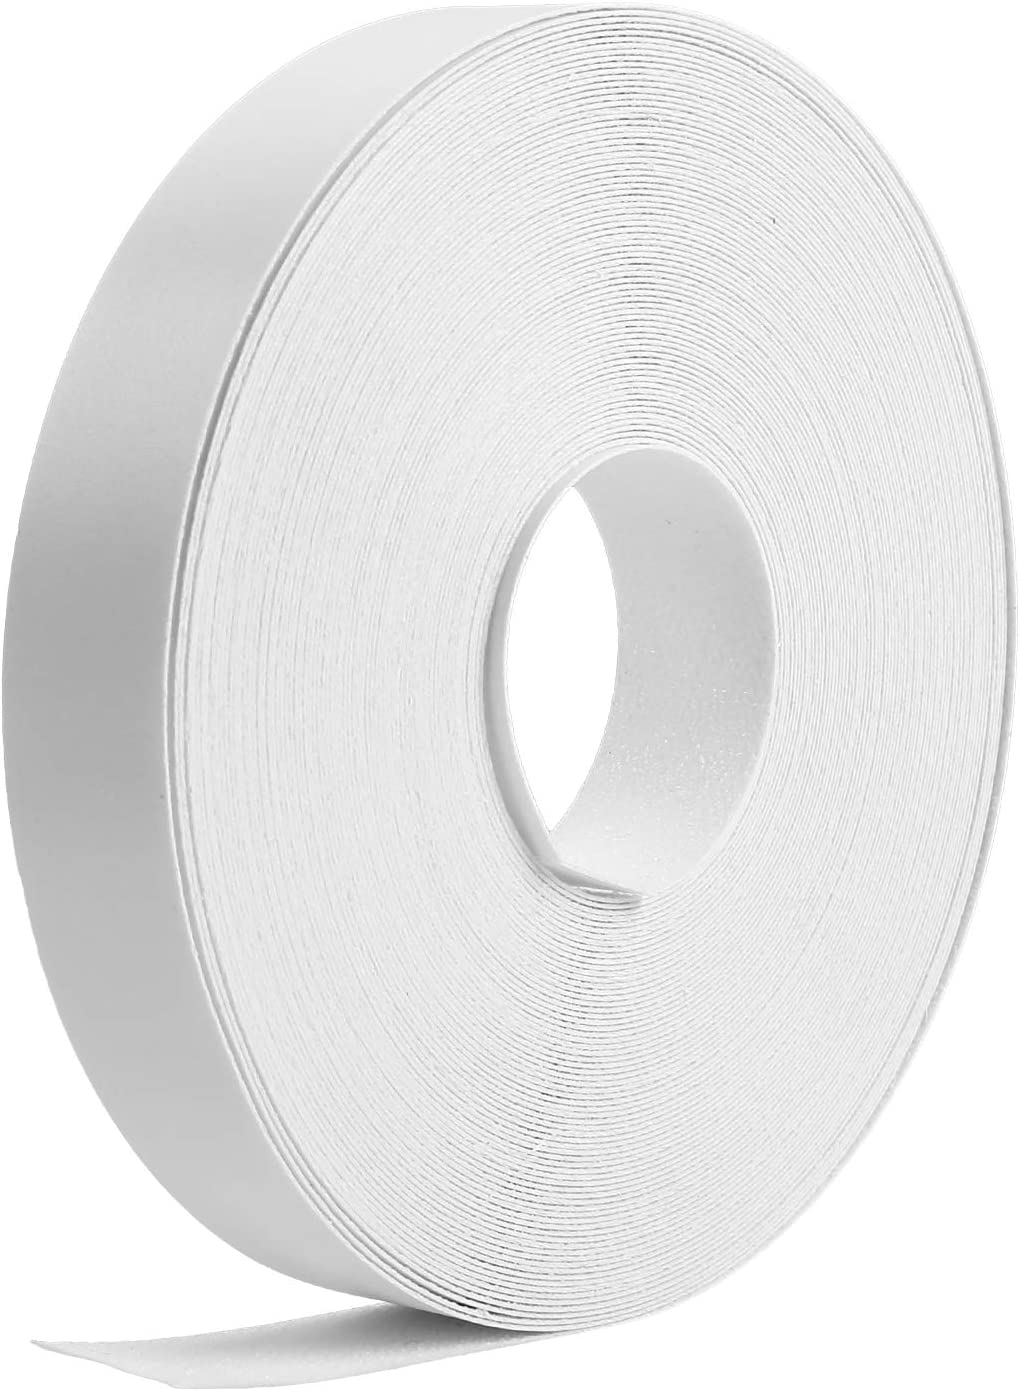 65 Feet Melamine Edging Strip Melamine Tape Iron-on Edgebanding Supplies Flexible Melamine Veneer Roll with Hot Melt Adhesive for Furniture Restoration (3/4 Inch, White)